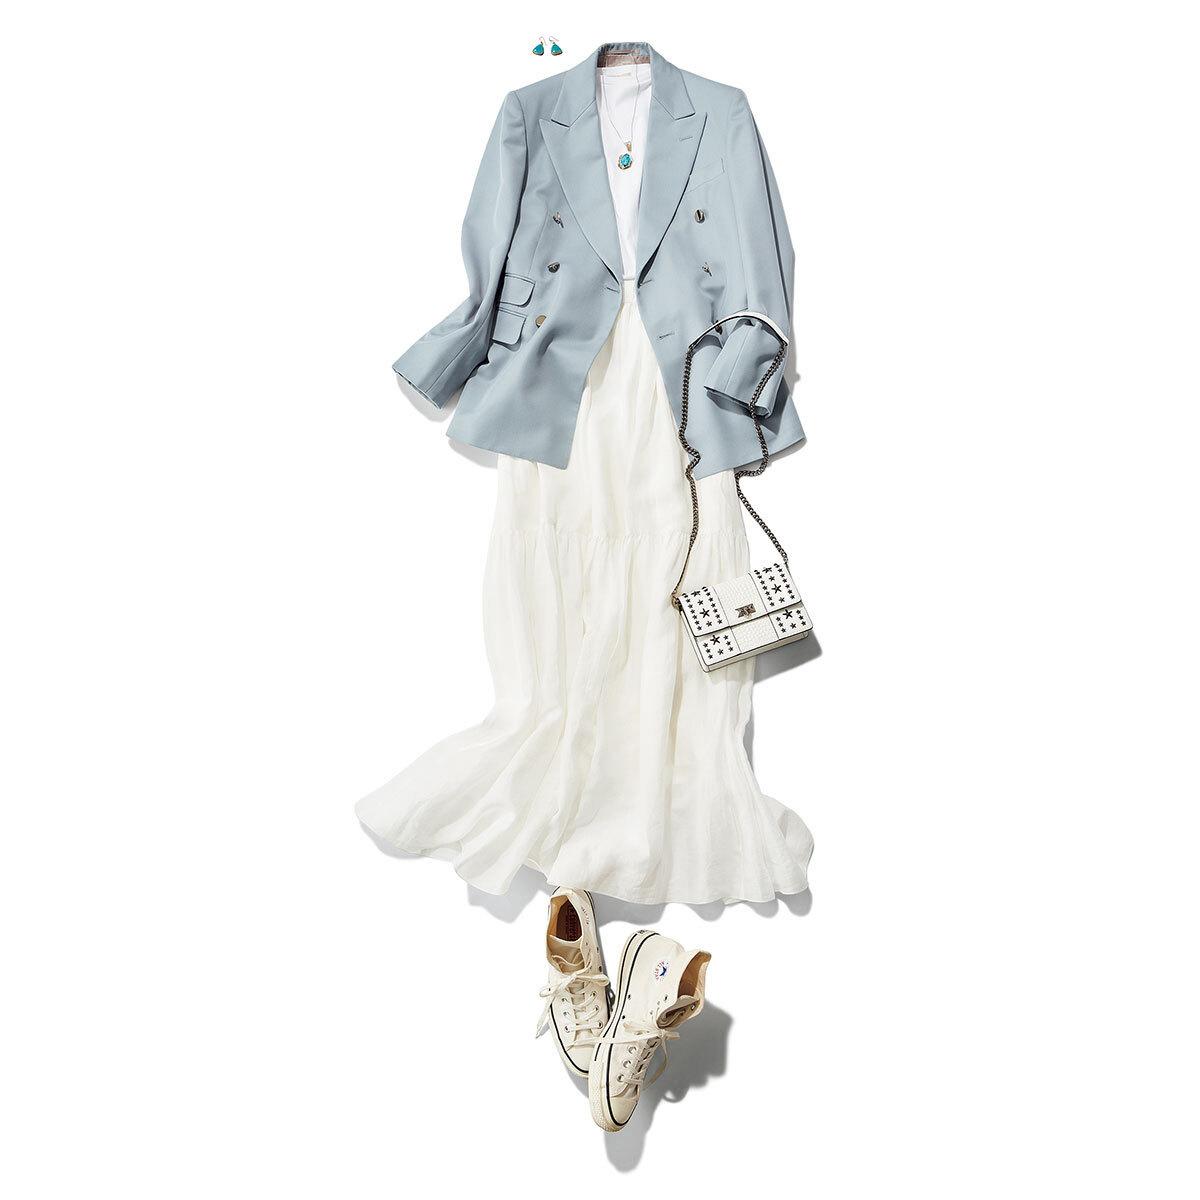 Blue×White サックスブルーに白を投入し、好感度と清潔感を盛り上げて